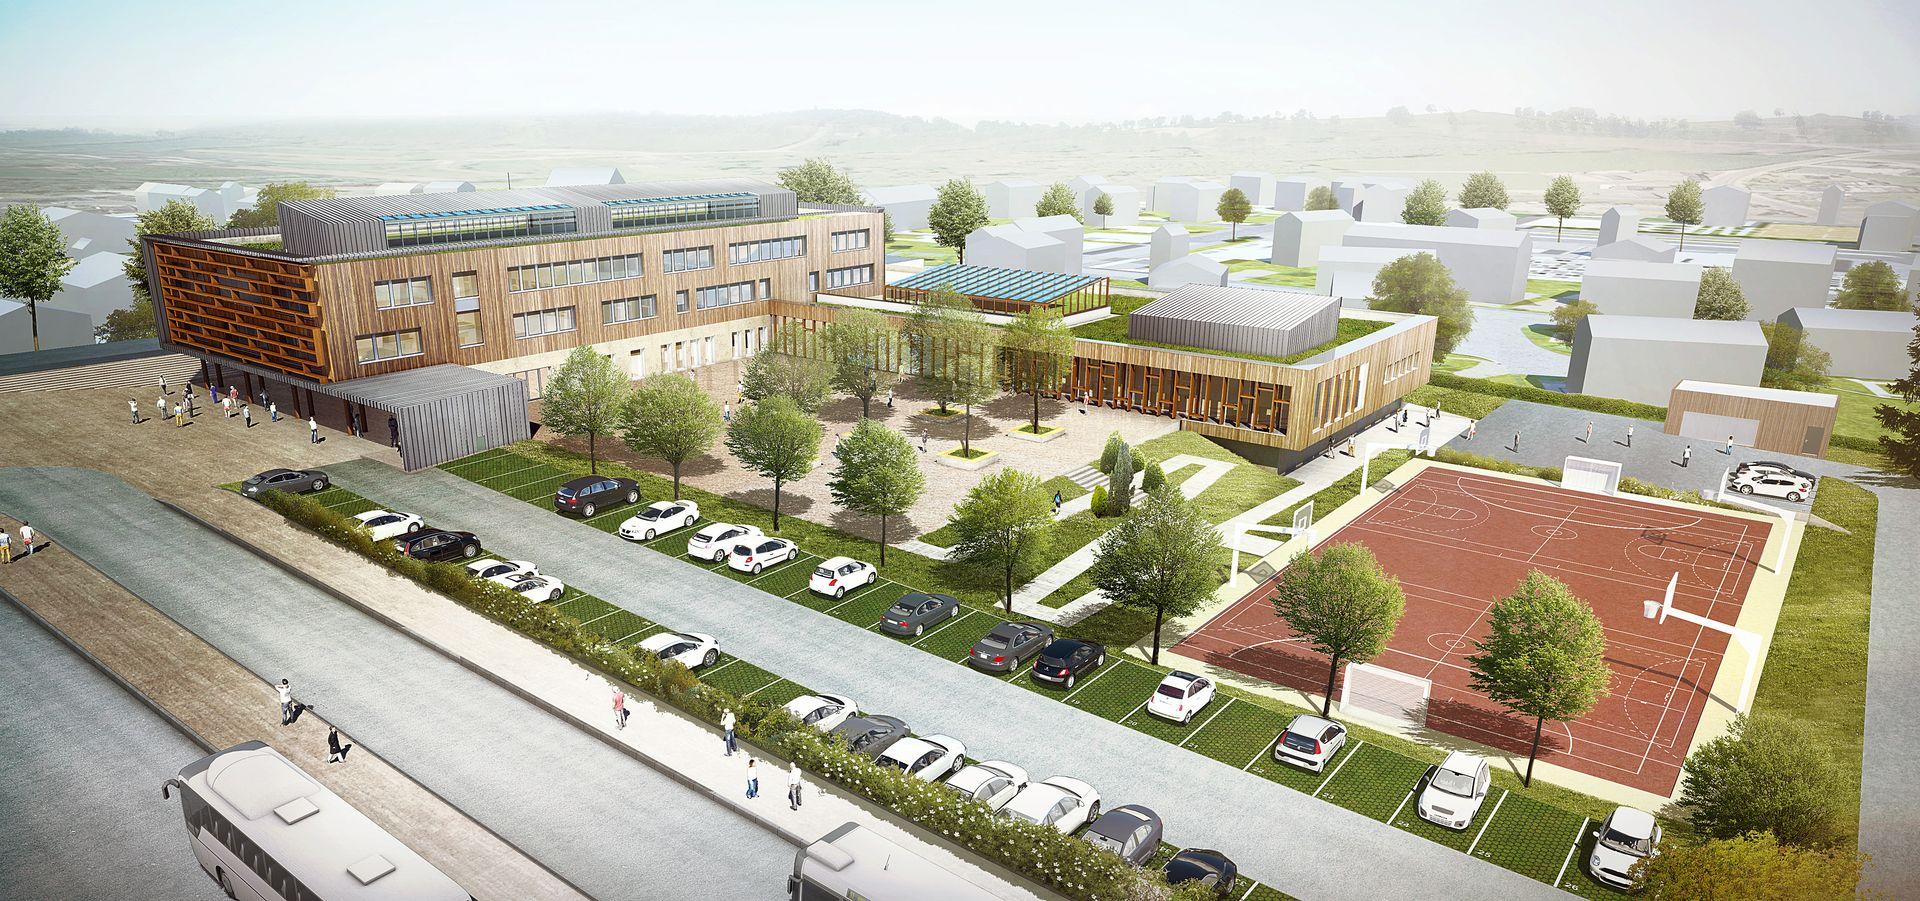 Collège-Bégard- Axonométrie